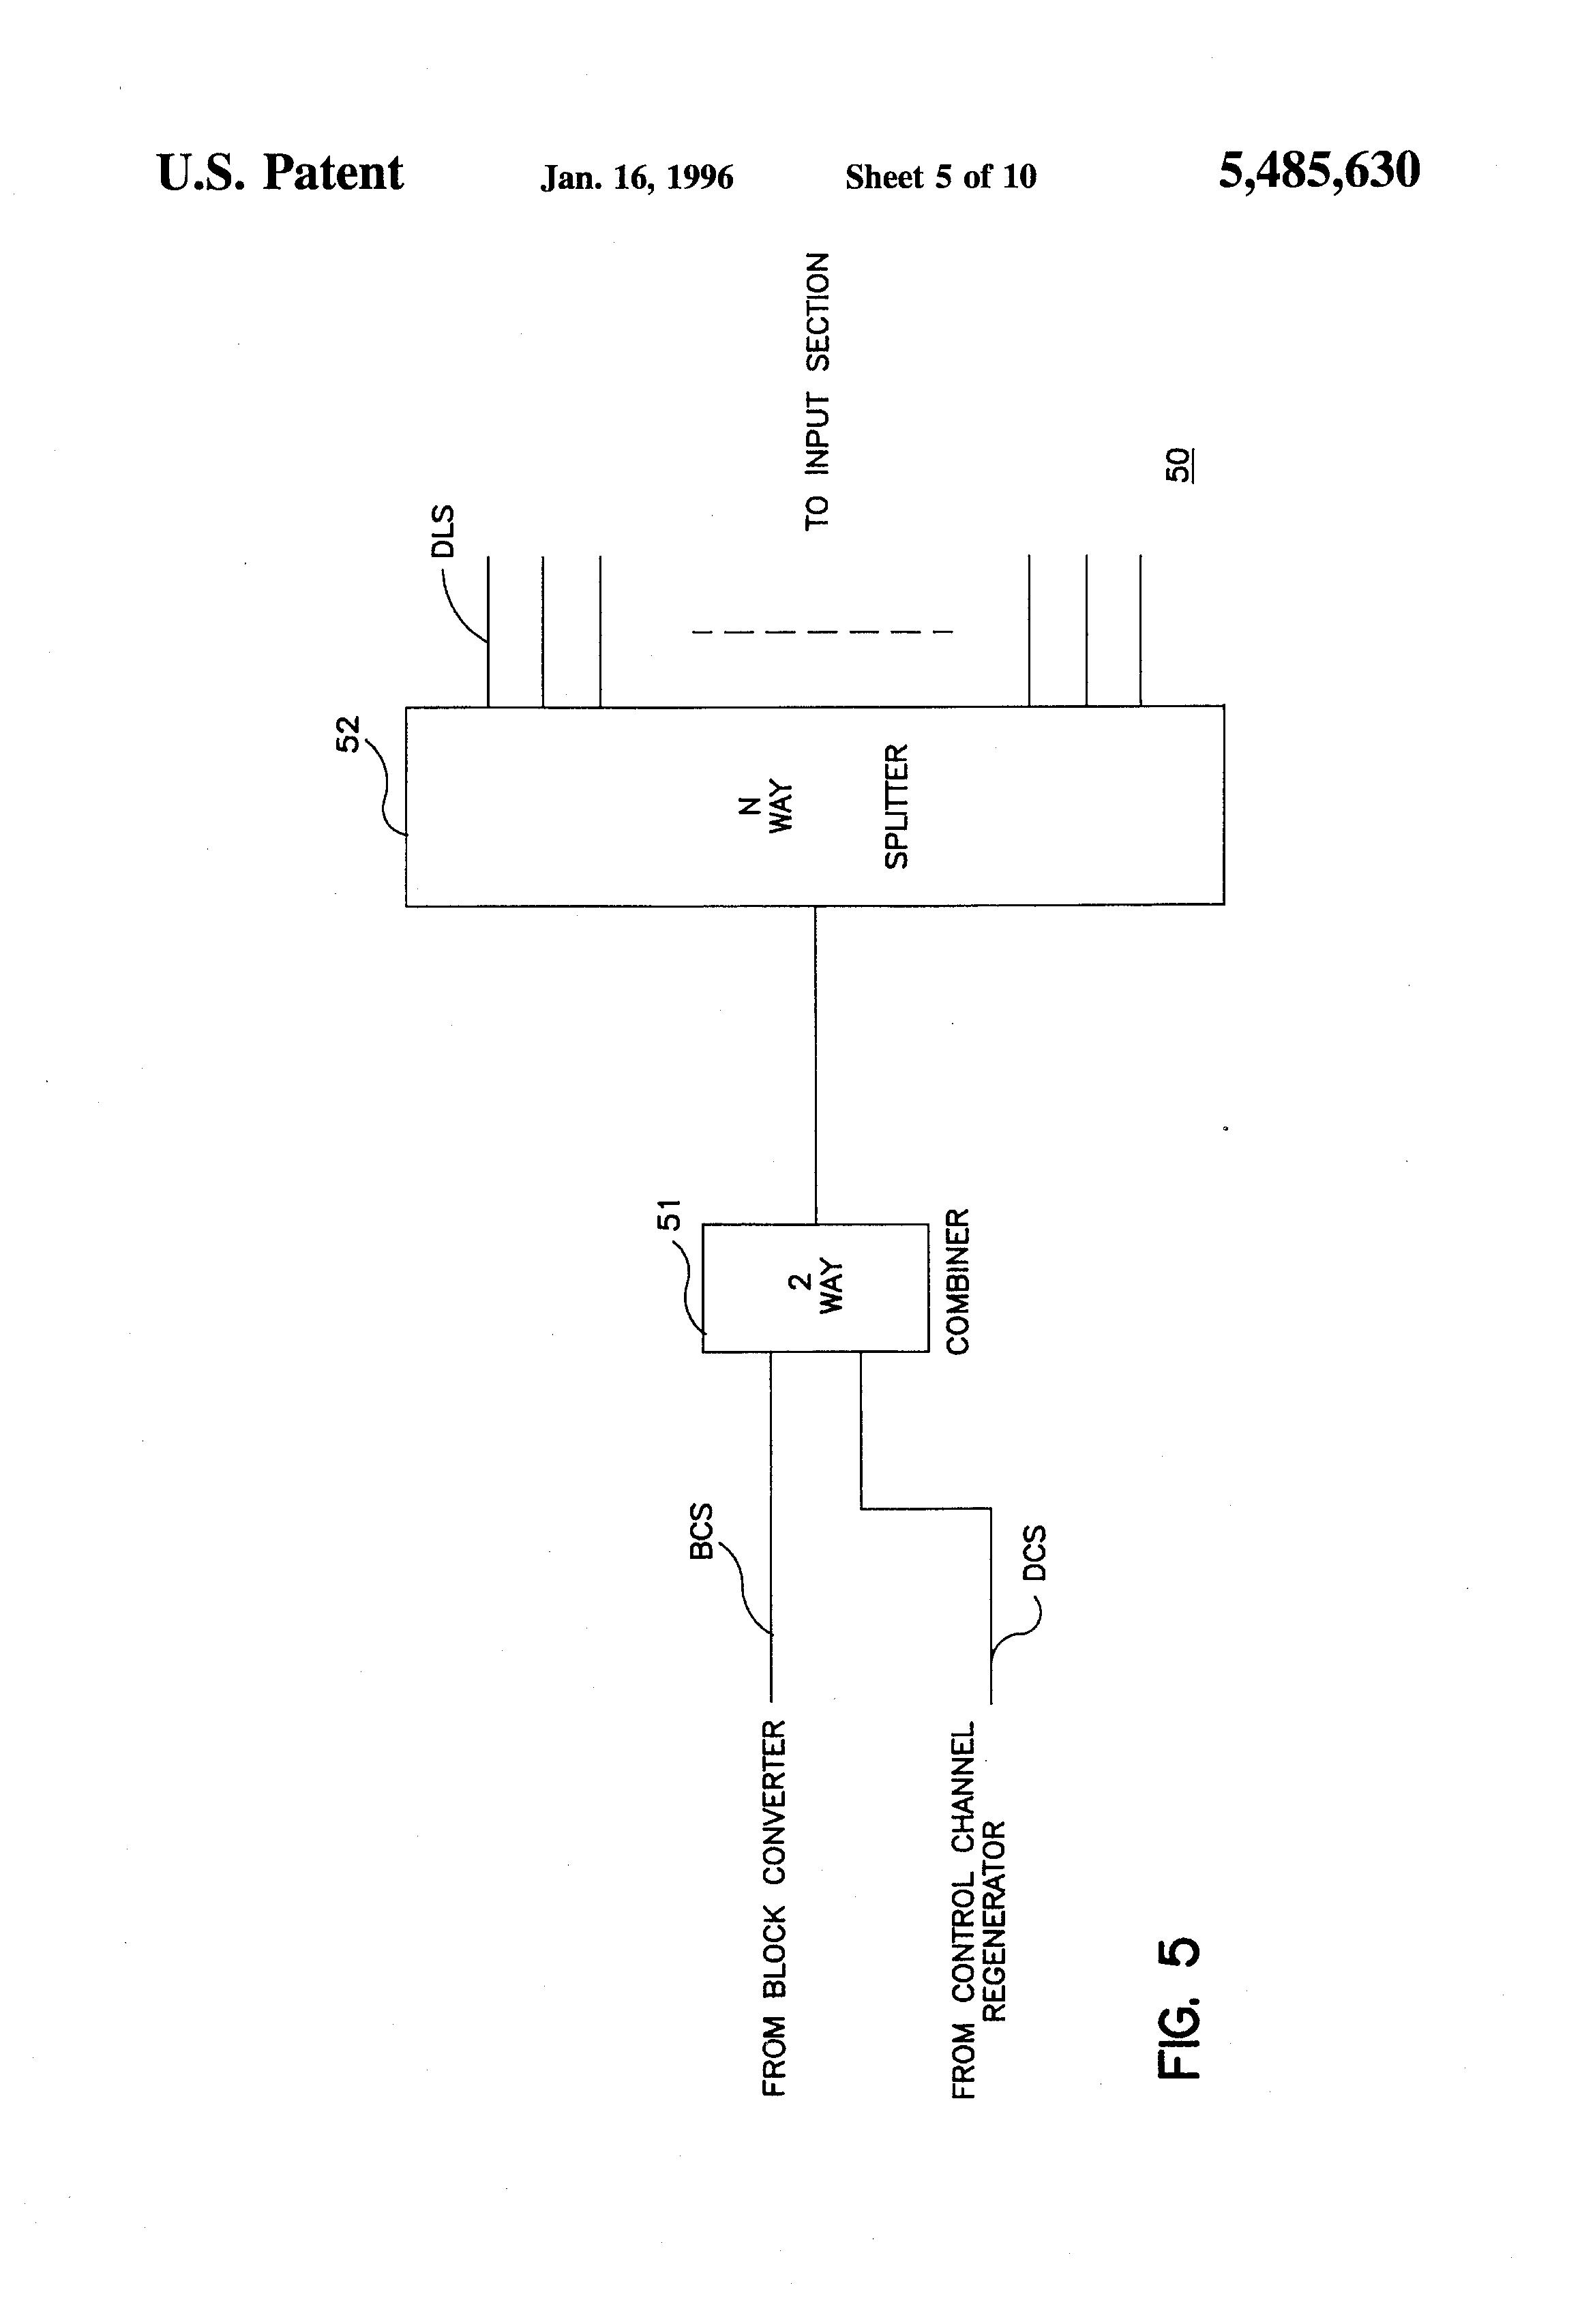 audio/video distribution system